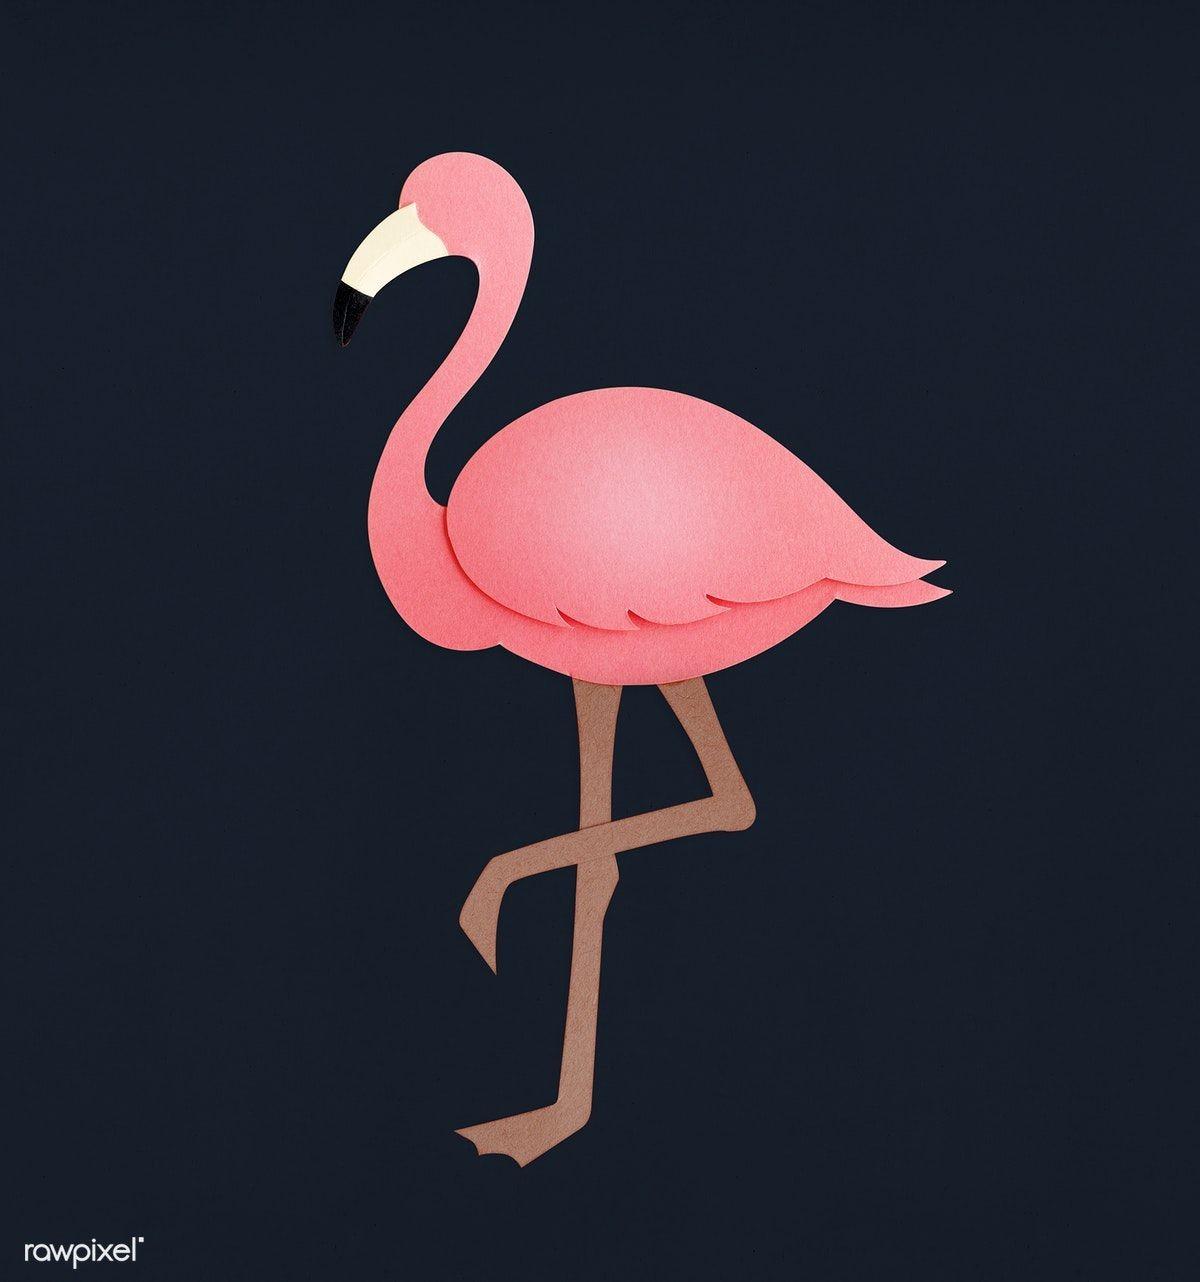 Papercraft Paradise Pink Flamingo Paper Craft Premium Image by Rawpixel